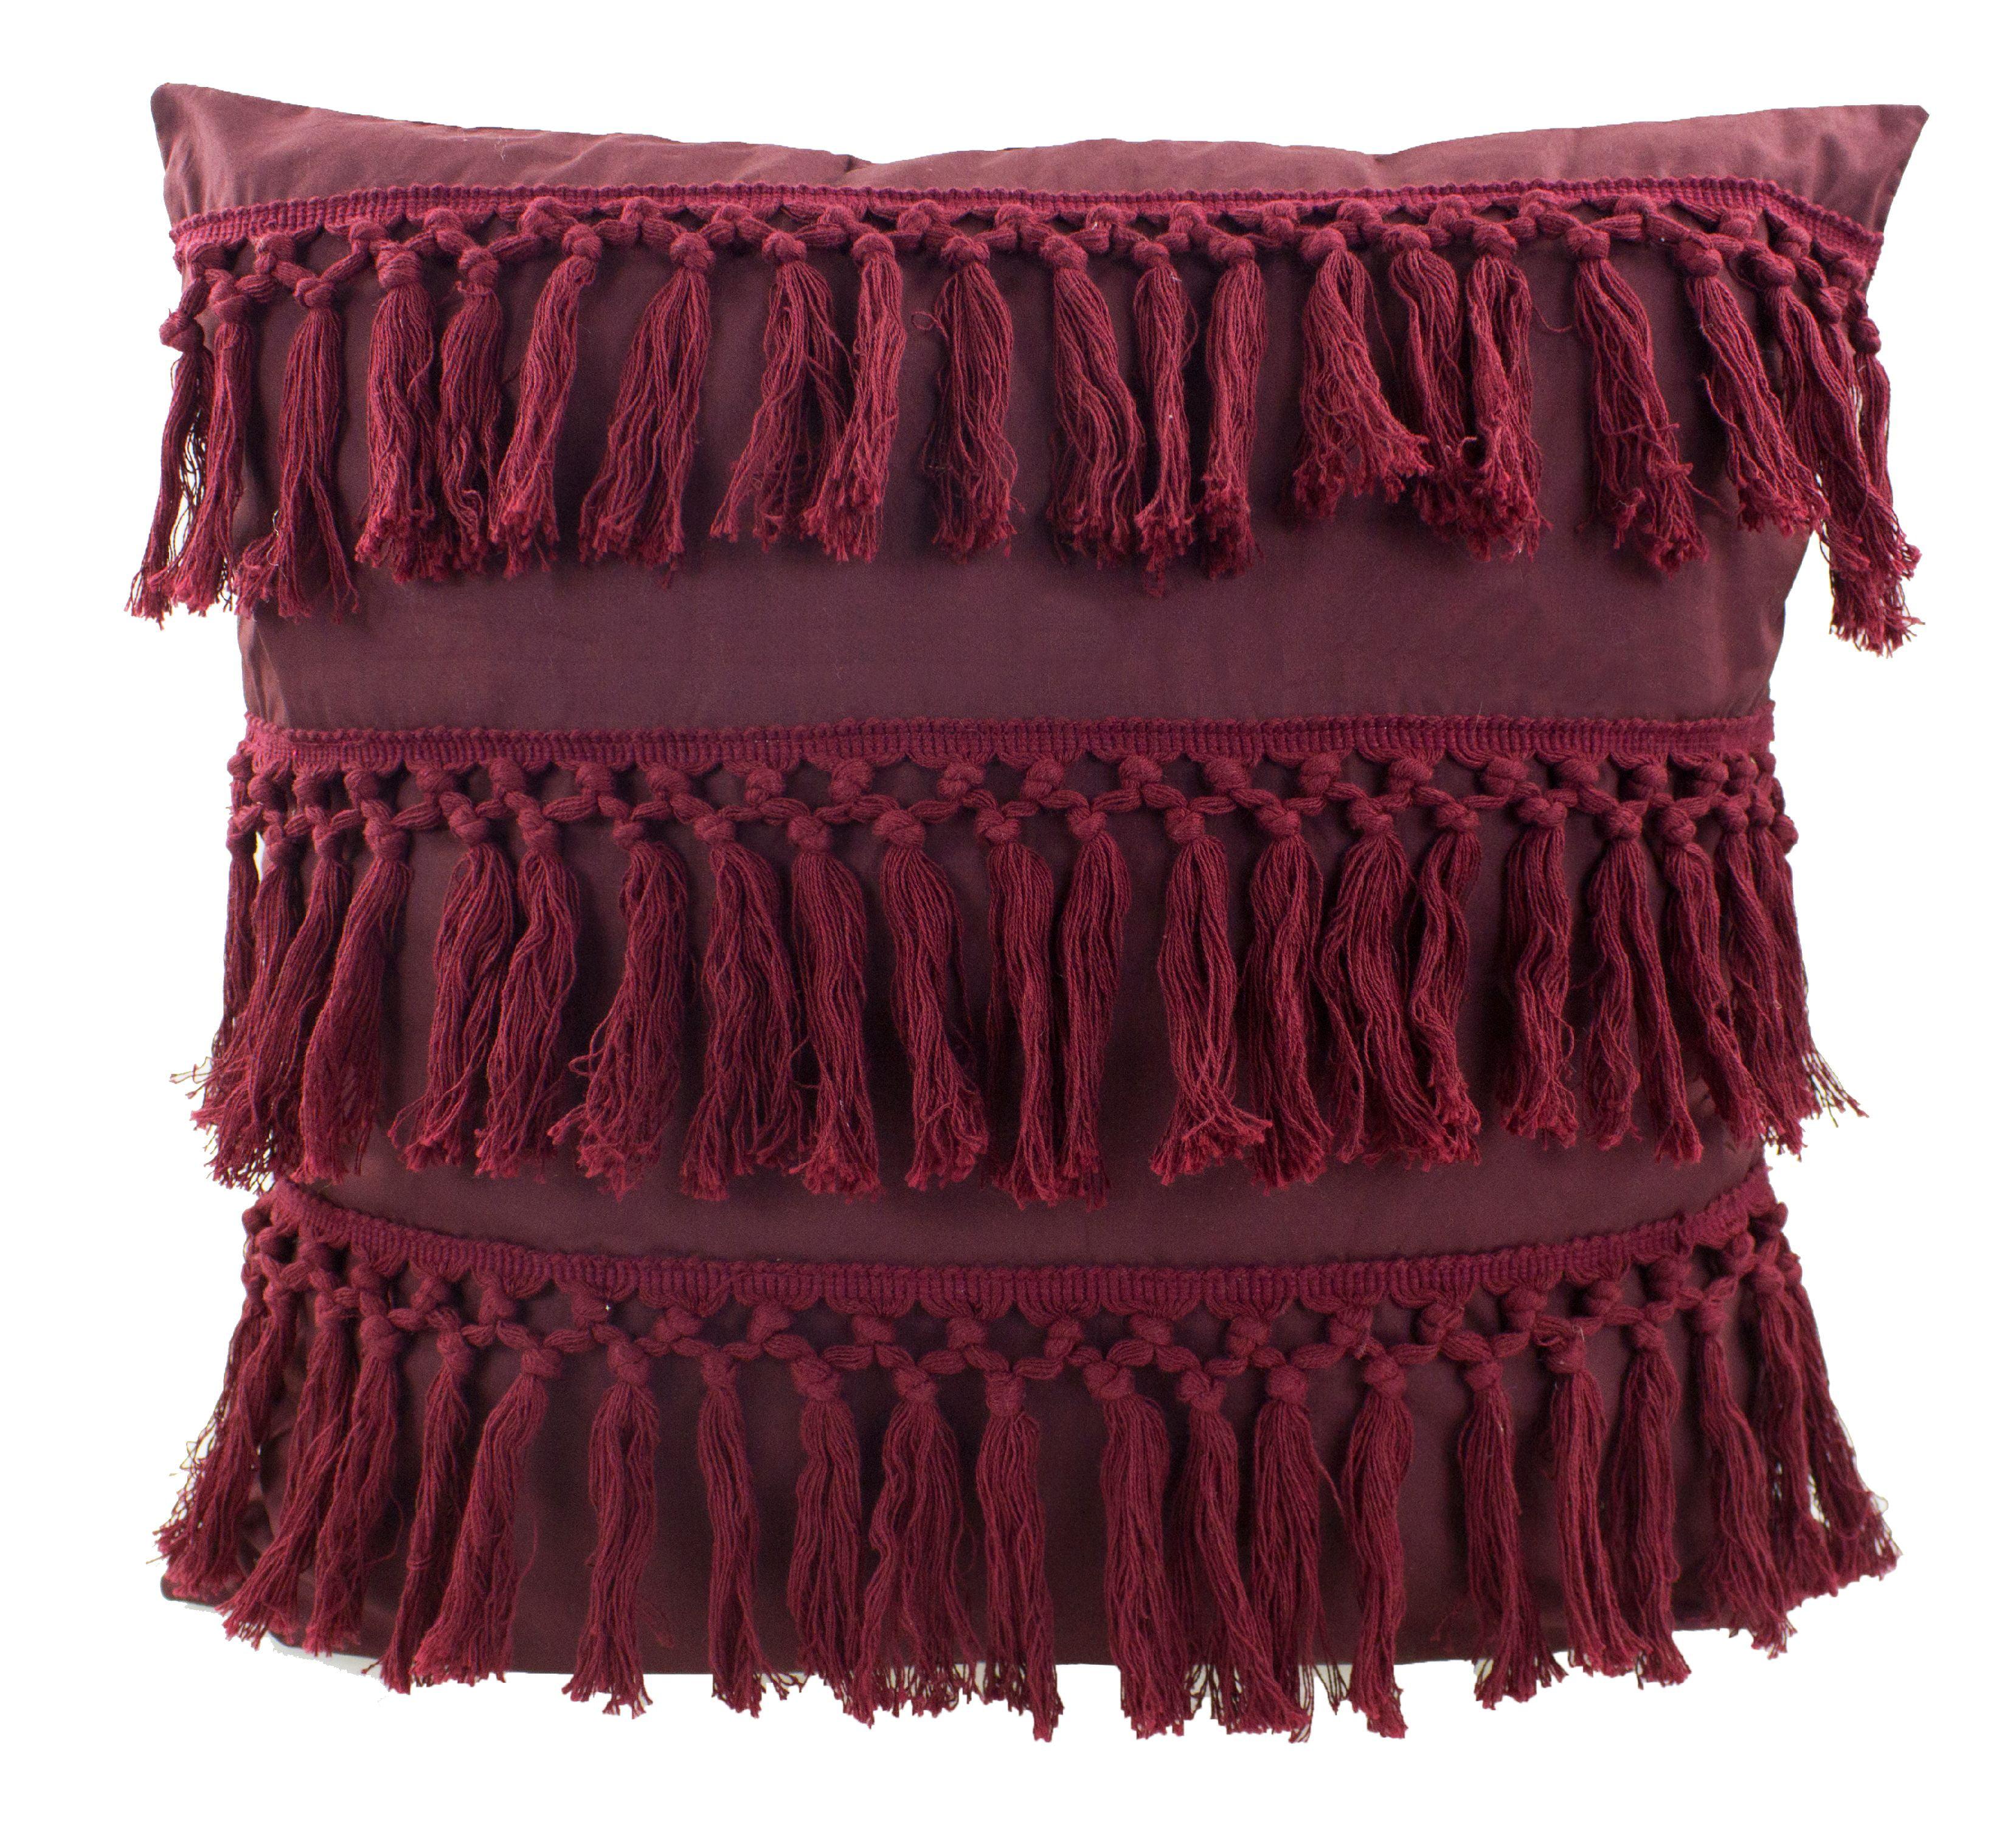 f955cc811ed Stylish Fringe Tassels Decorative Cotton Throw Pillow (Burgundy